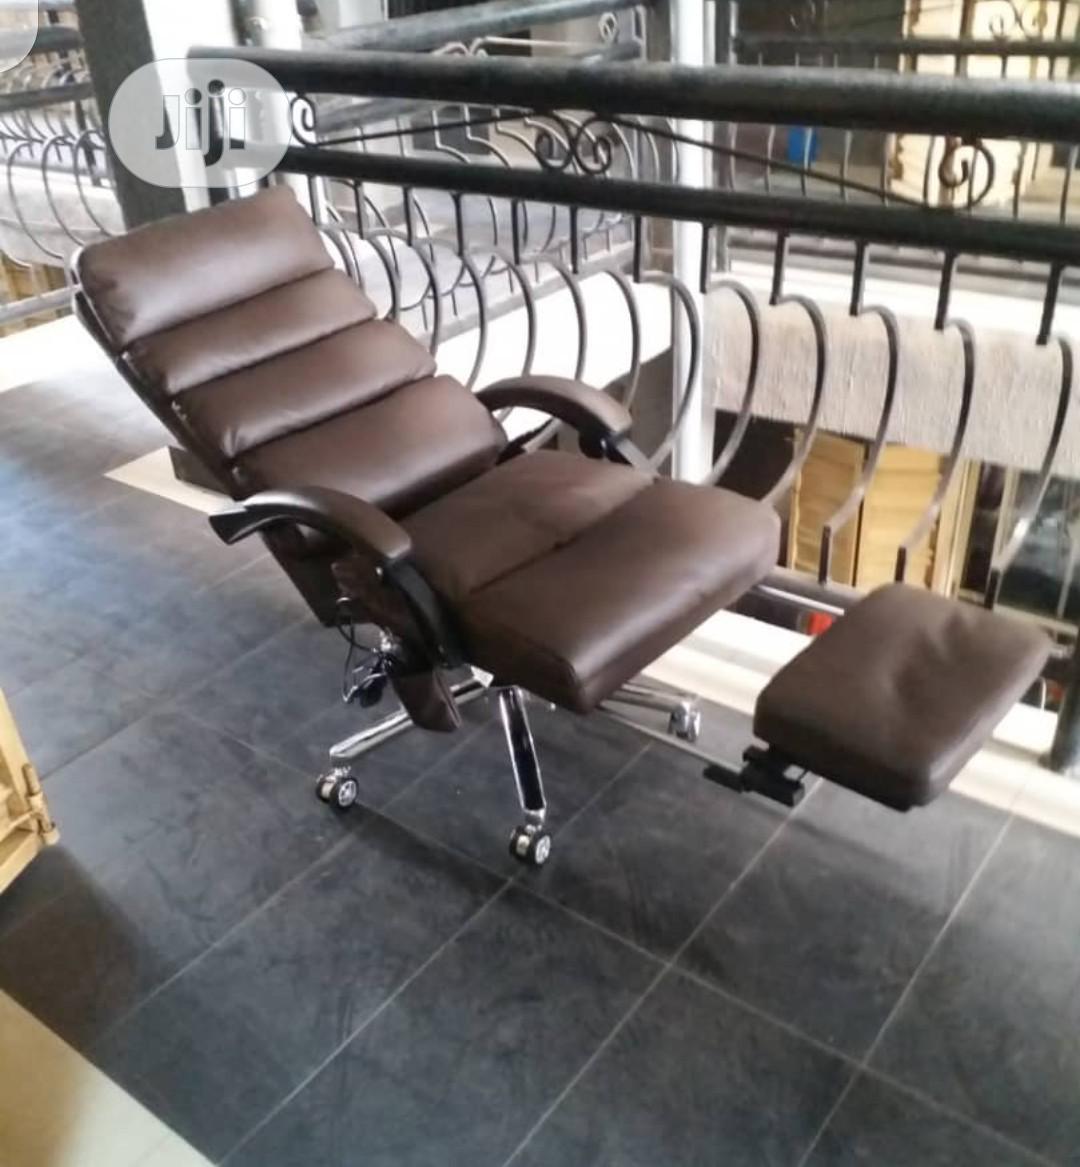 Recline Massage Chair Electronic